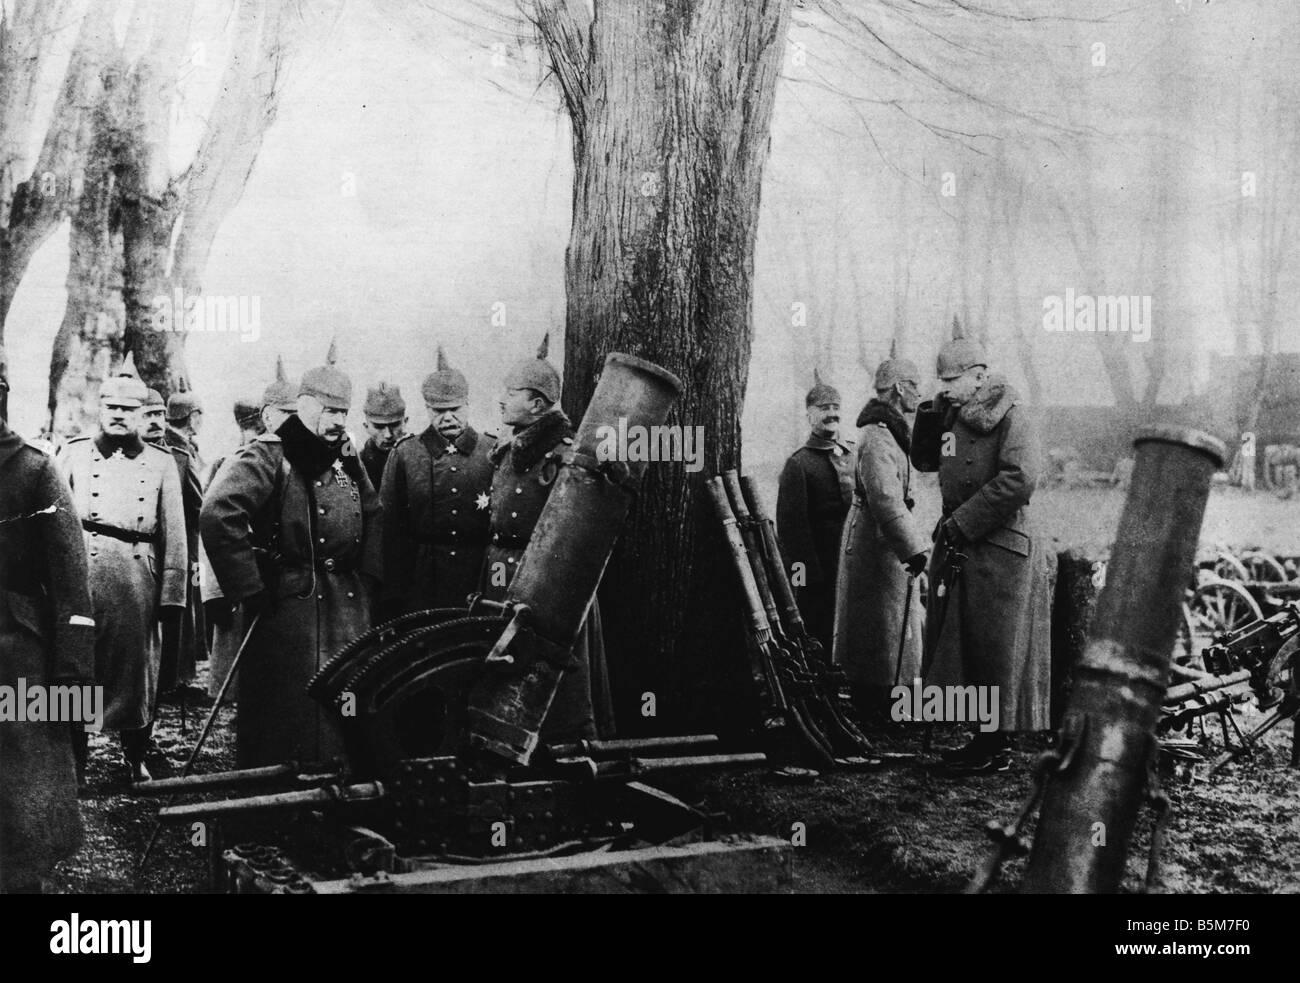 1 W46 F1917 26 E Wilhelm II inspects war loot c 1917 Wilhelm II German emperor 1888 1918 1859 1941 During World - Stock Image